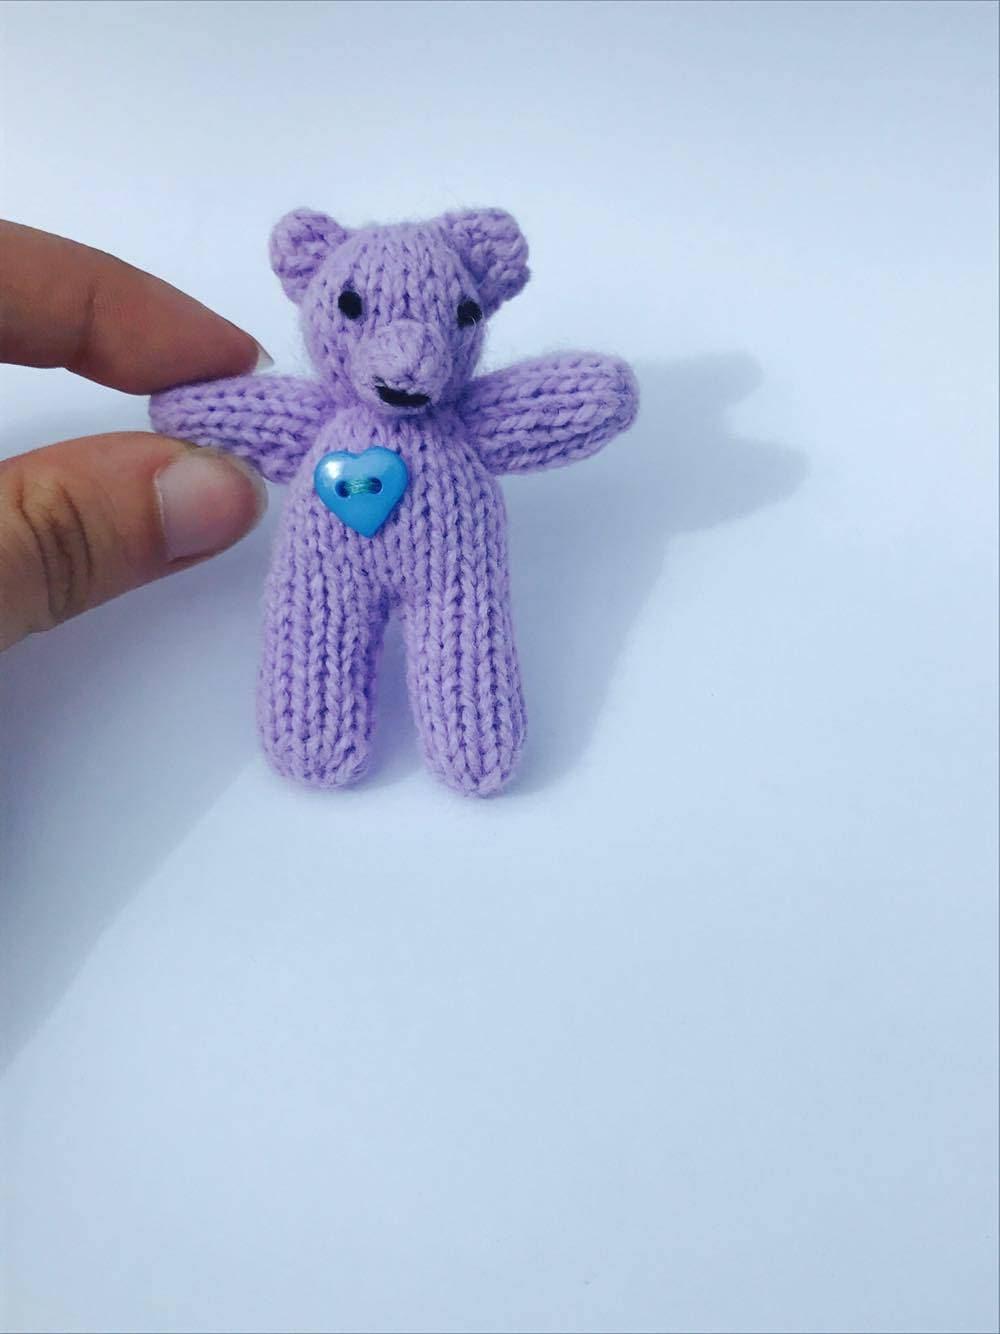 Mini Purple Teddy Bear  Knitted  7.5cm Purple with Blue Heart Button